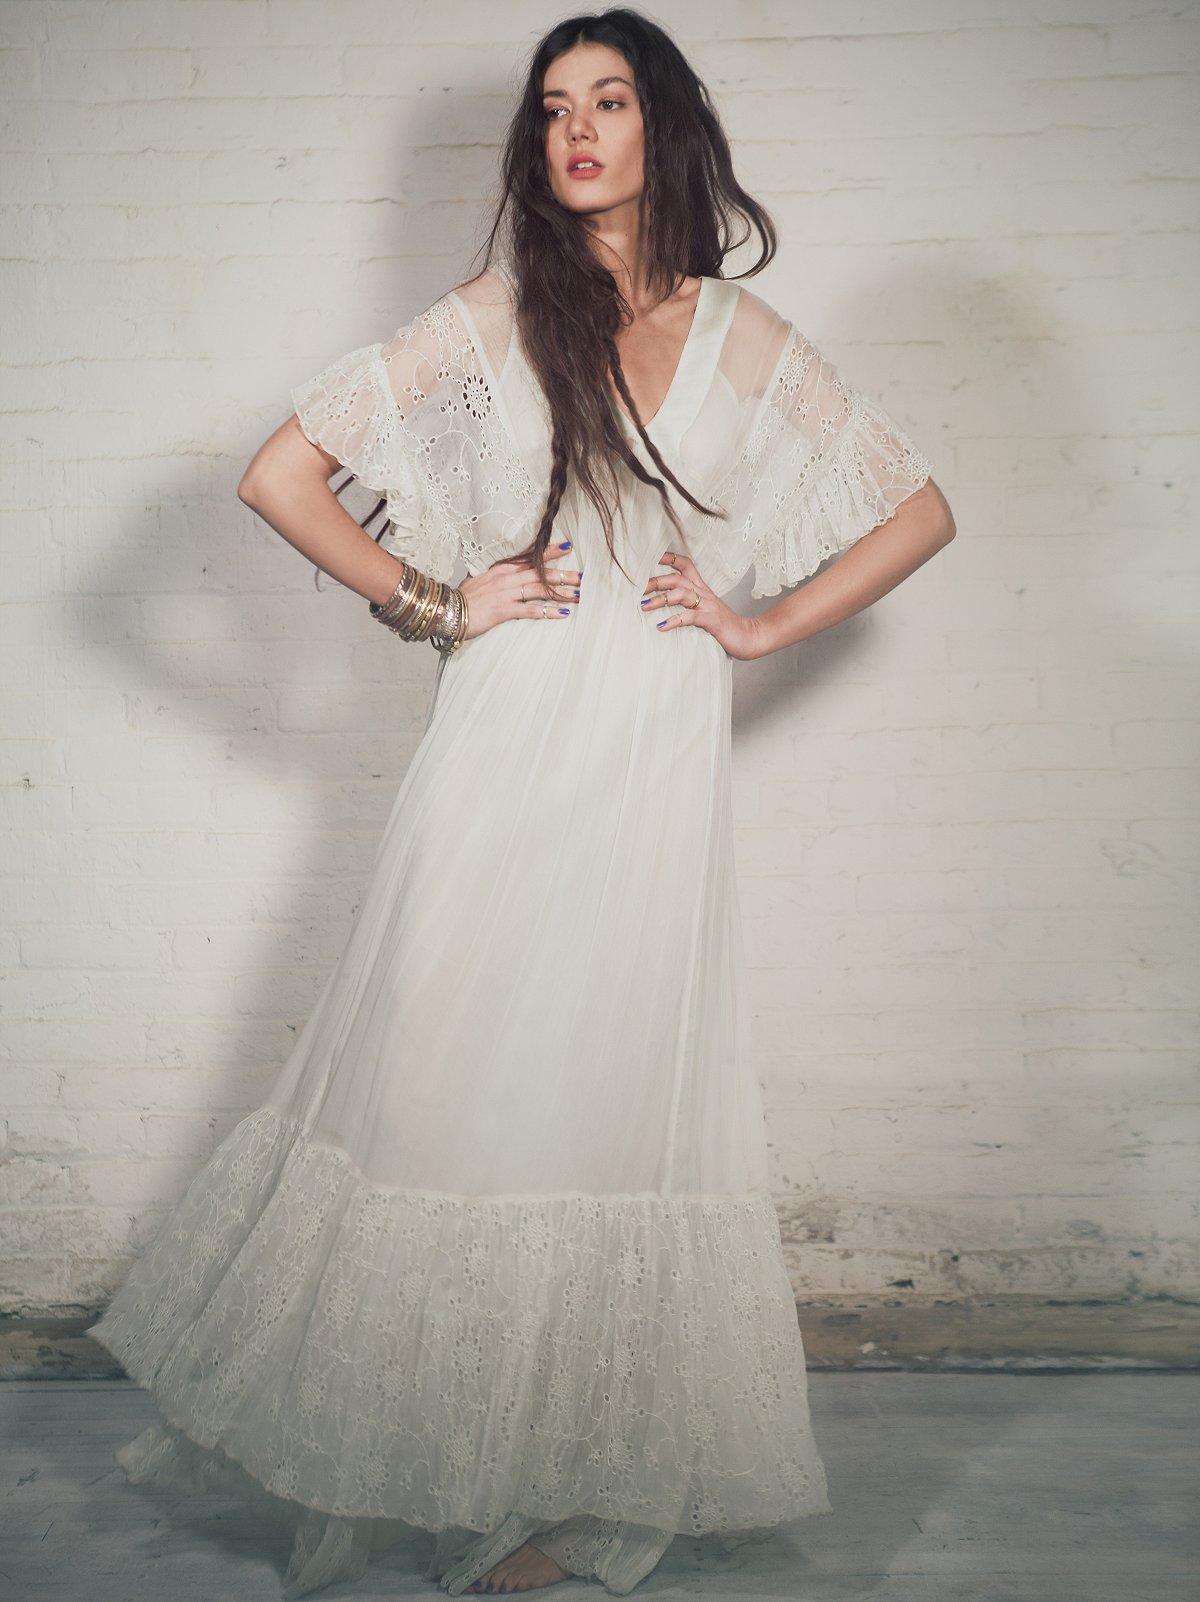 Aurore Eyelet Dress